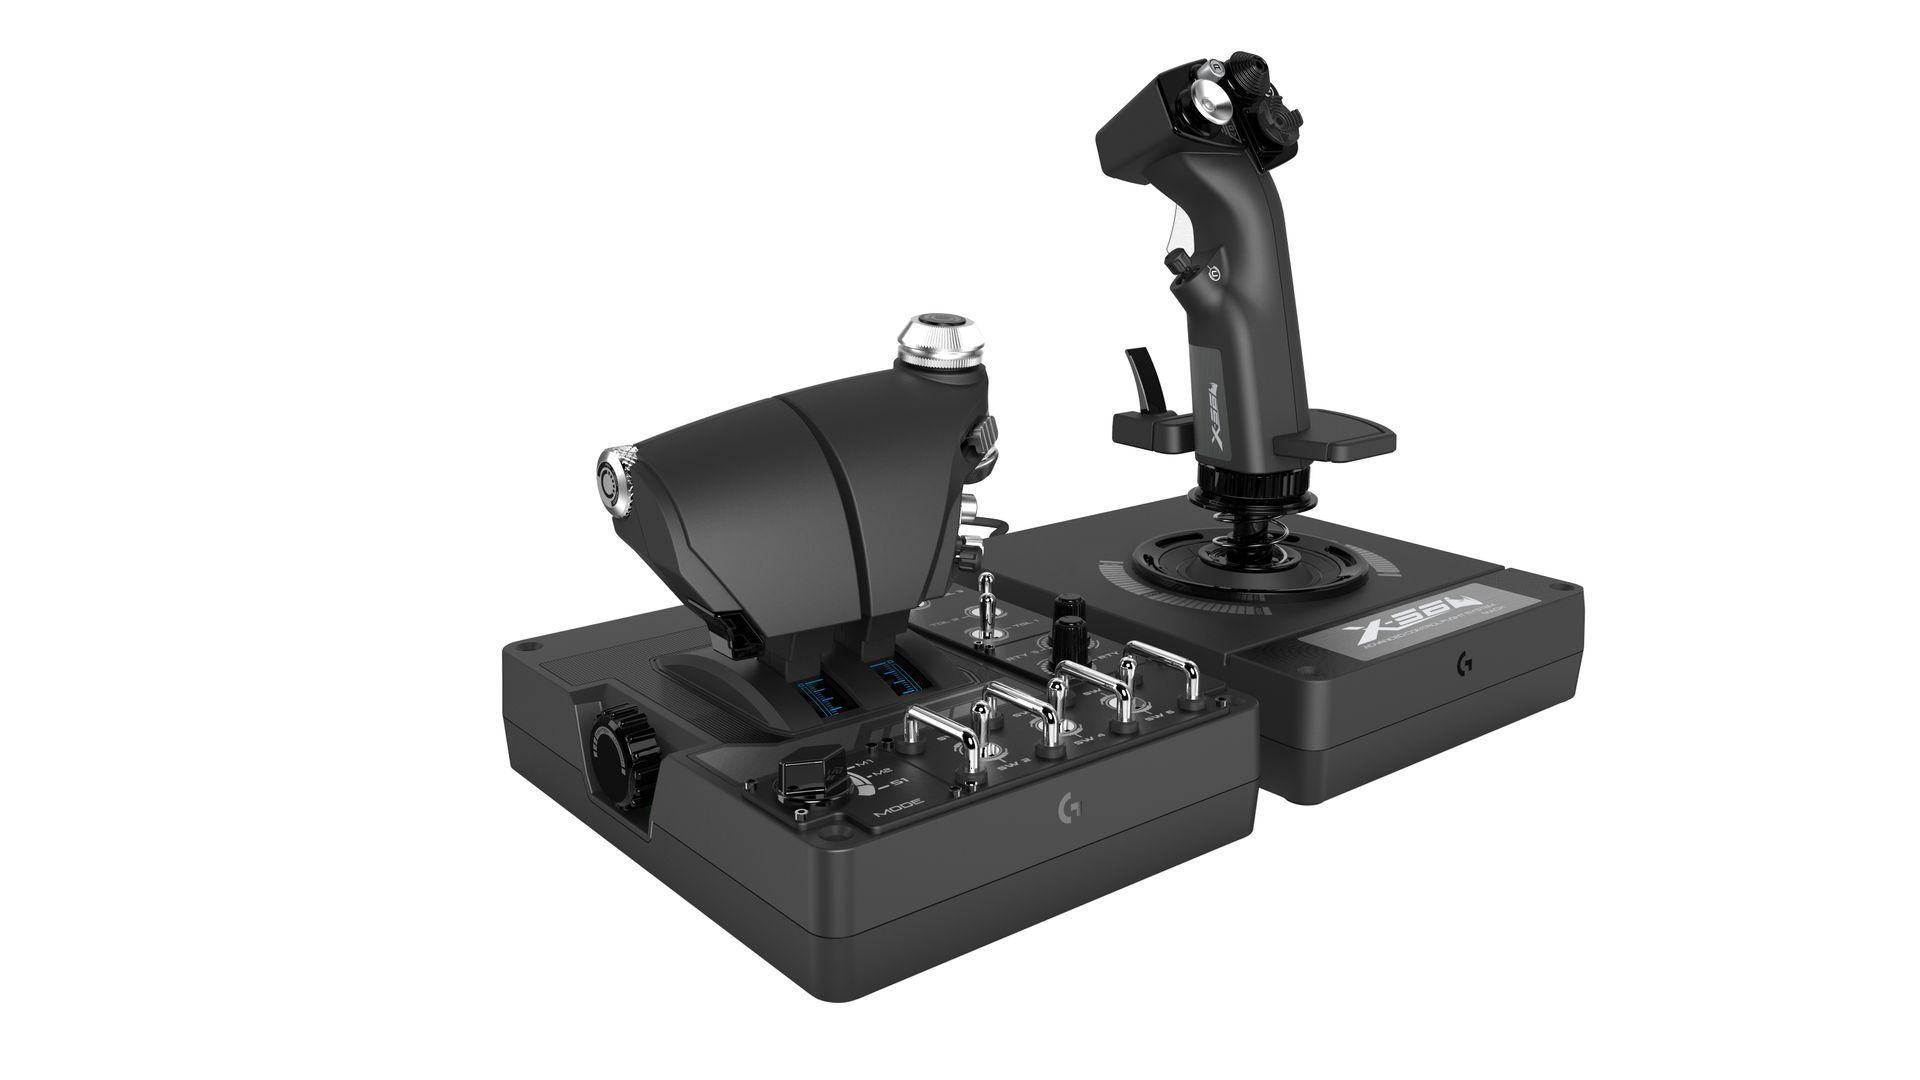 Logitech X56 H.O.T.A.S Throttle and Joystick Black (945-000059)